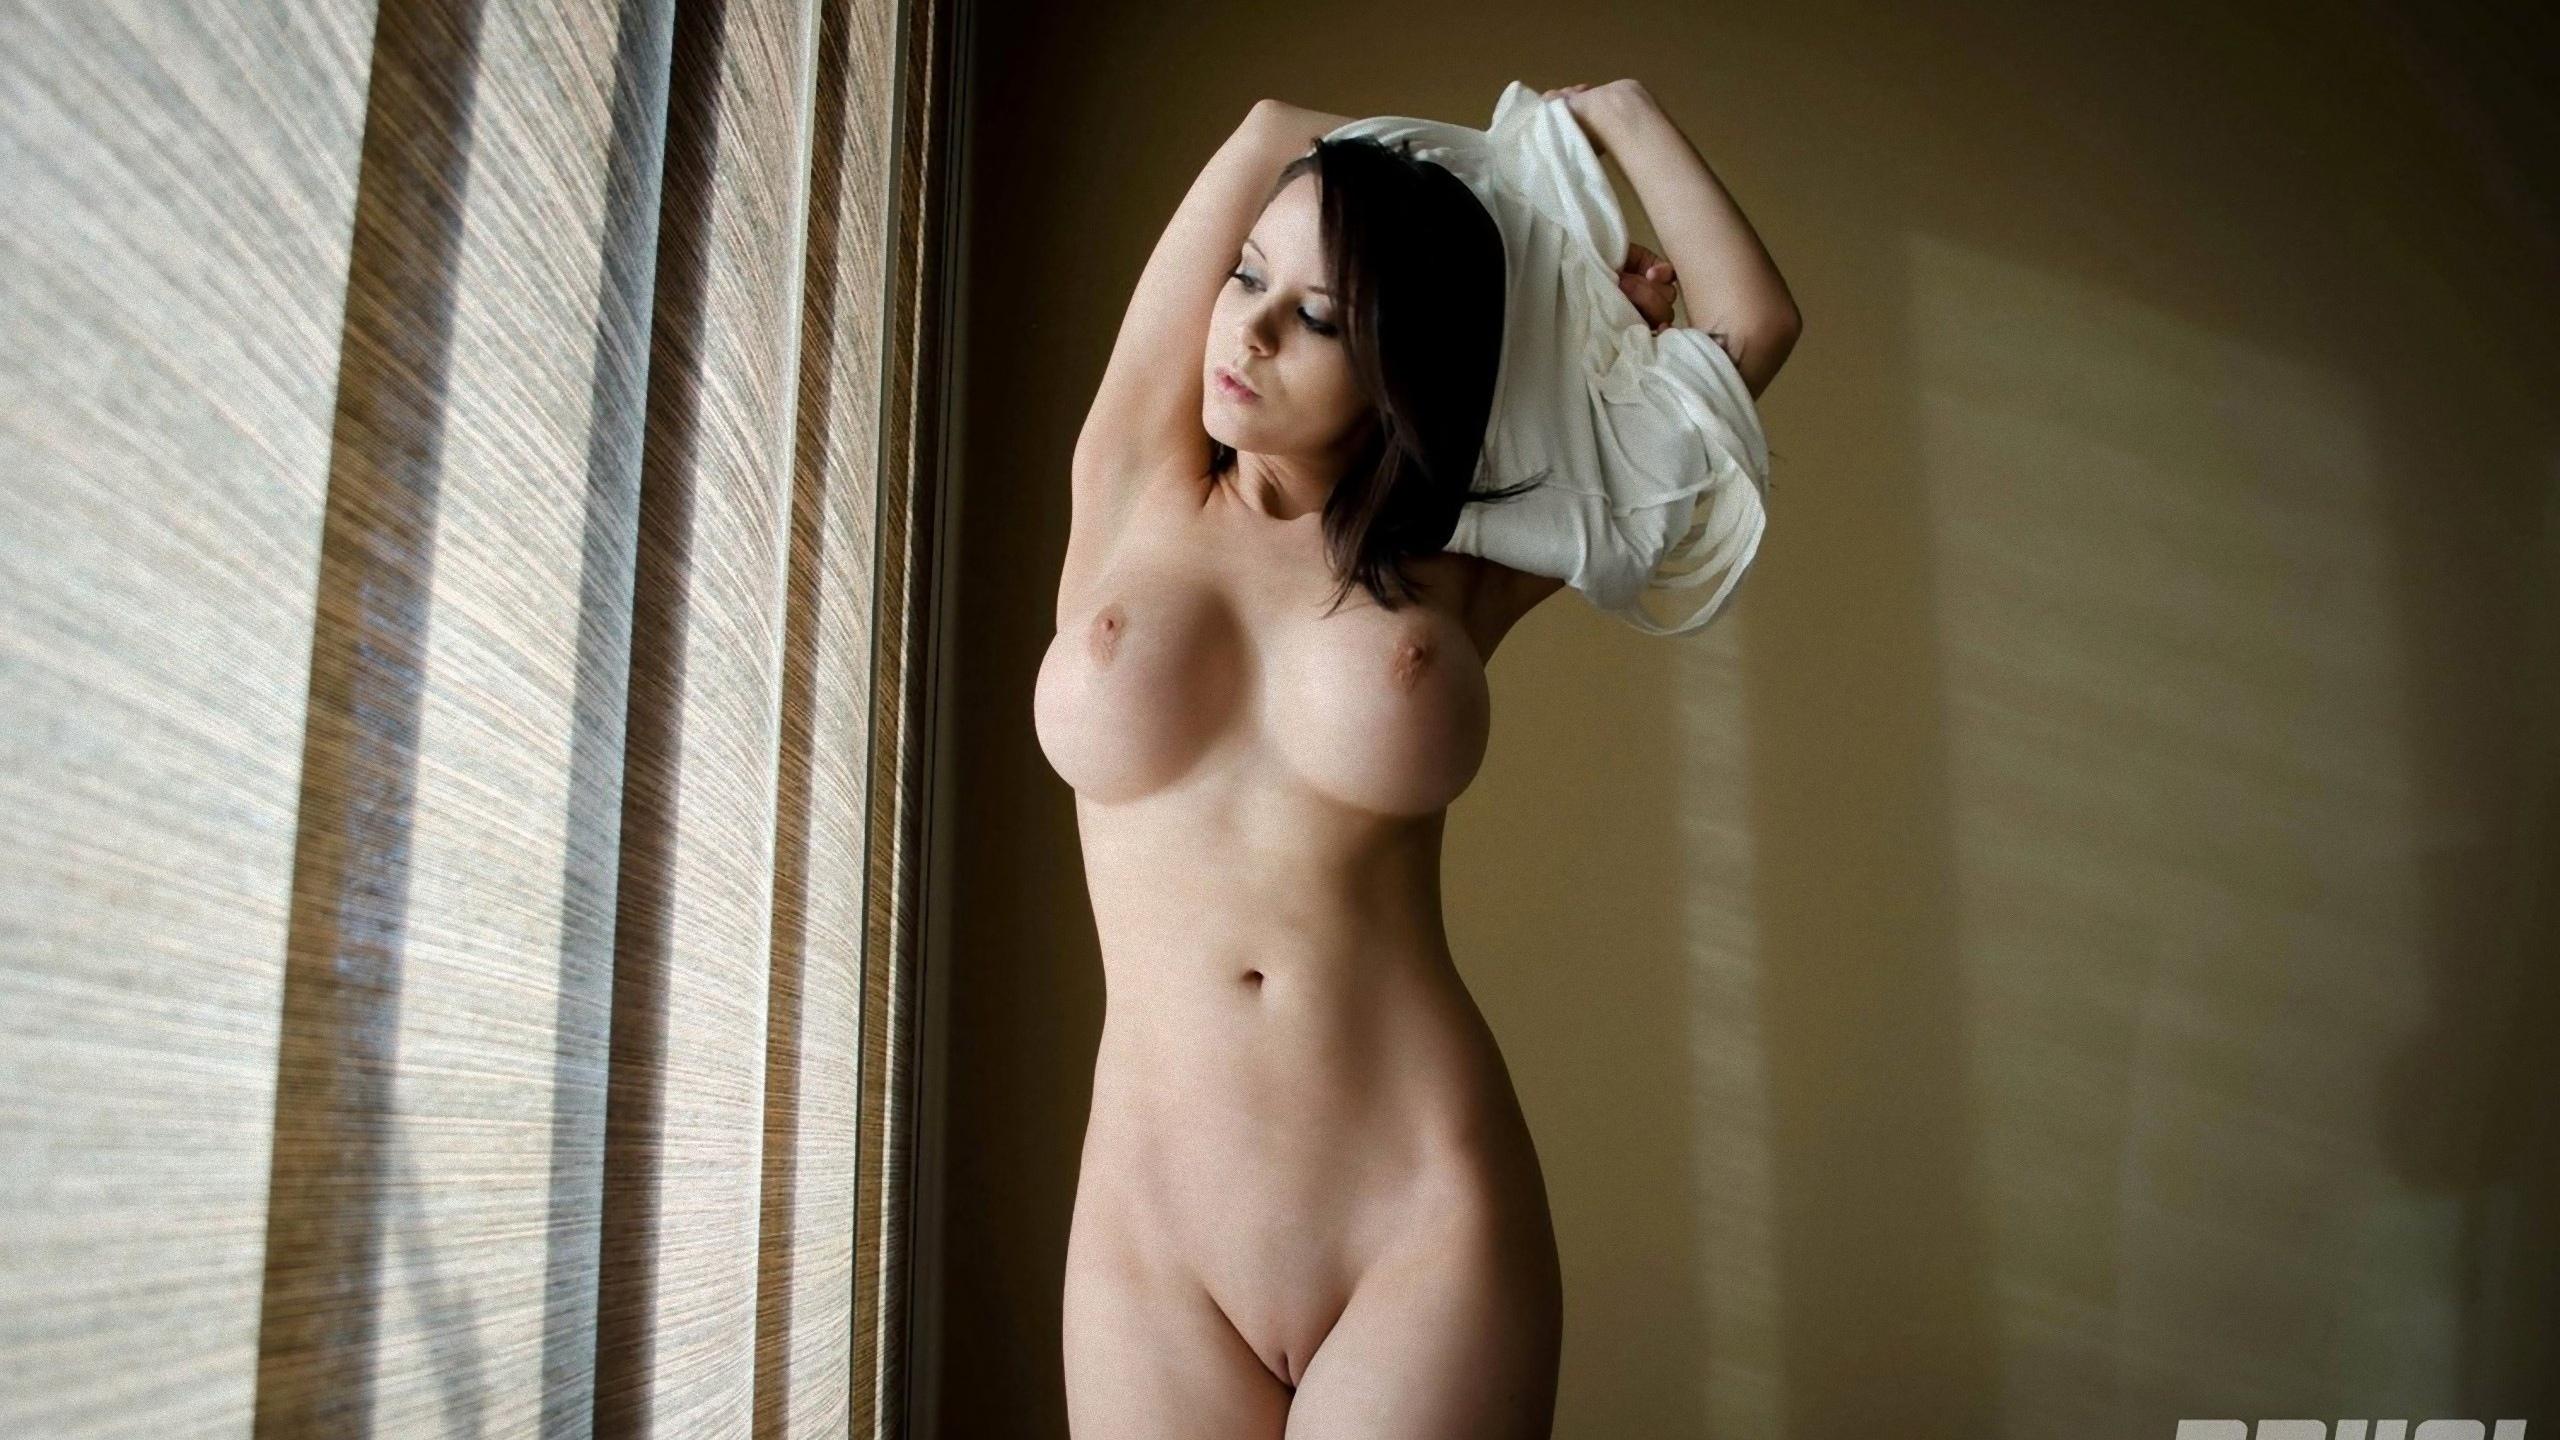 Фото эротика девушки ютуб 20 фотография